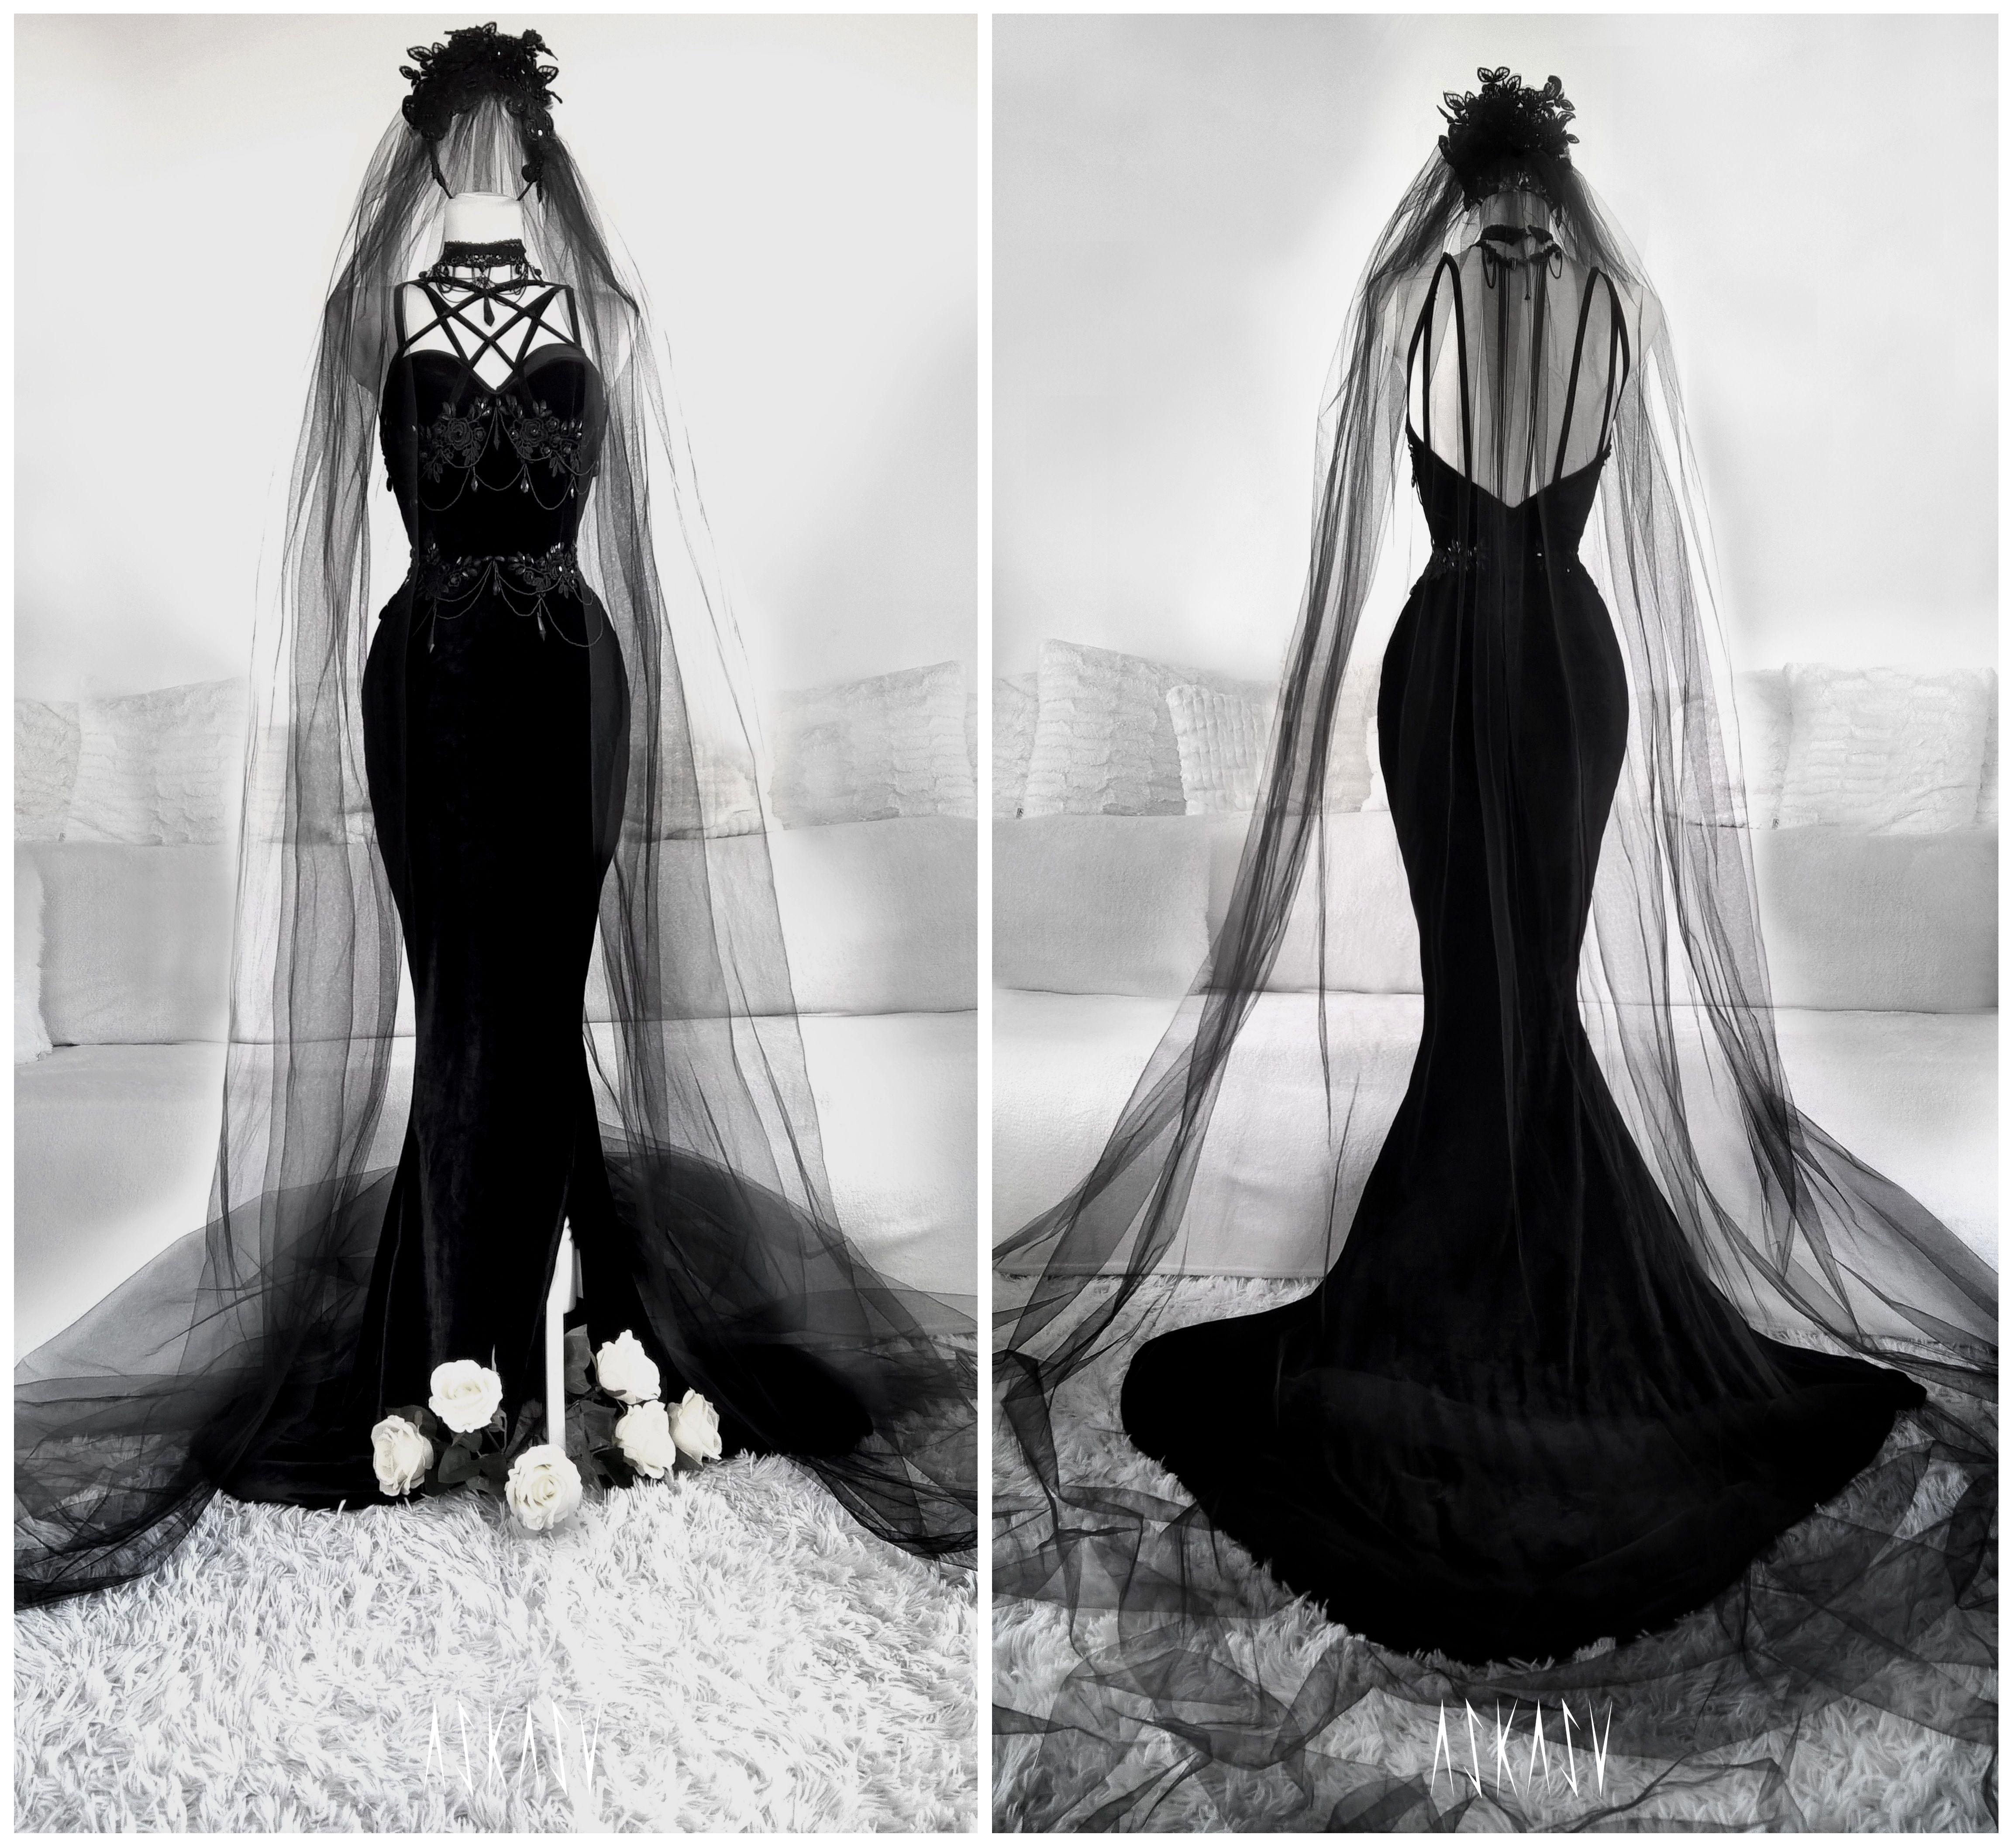 Velvet Gown By Askasu Black Weddingdress Blackgown Goth Morticia Addams Sirendress Veil Harness